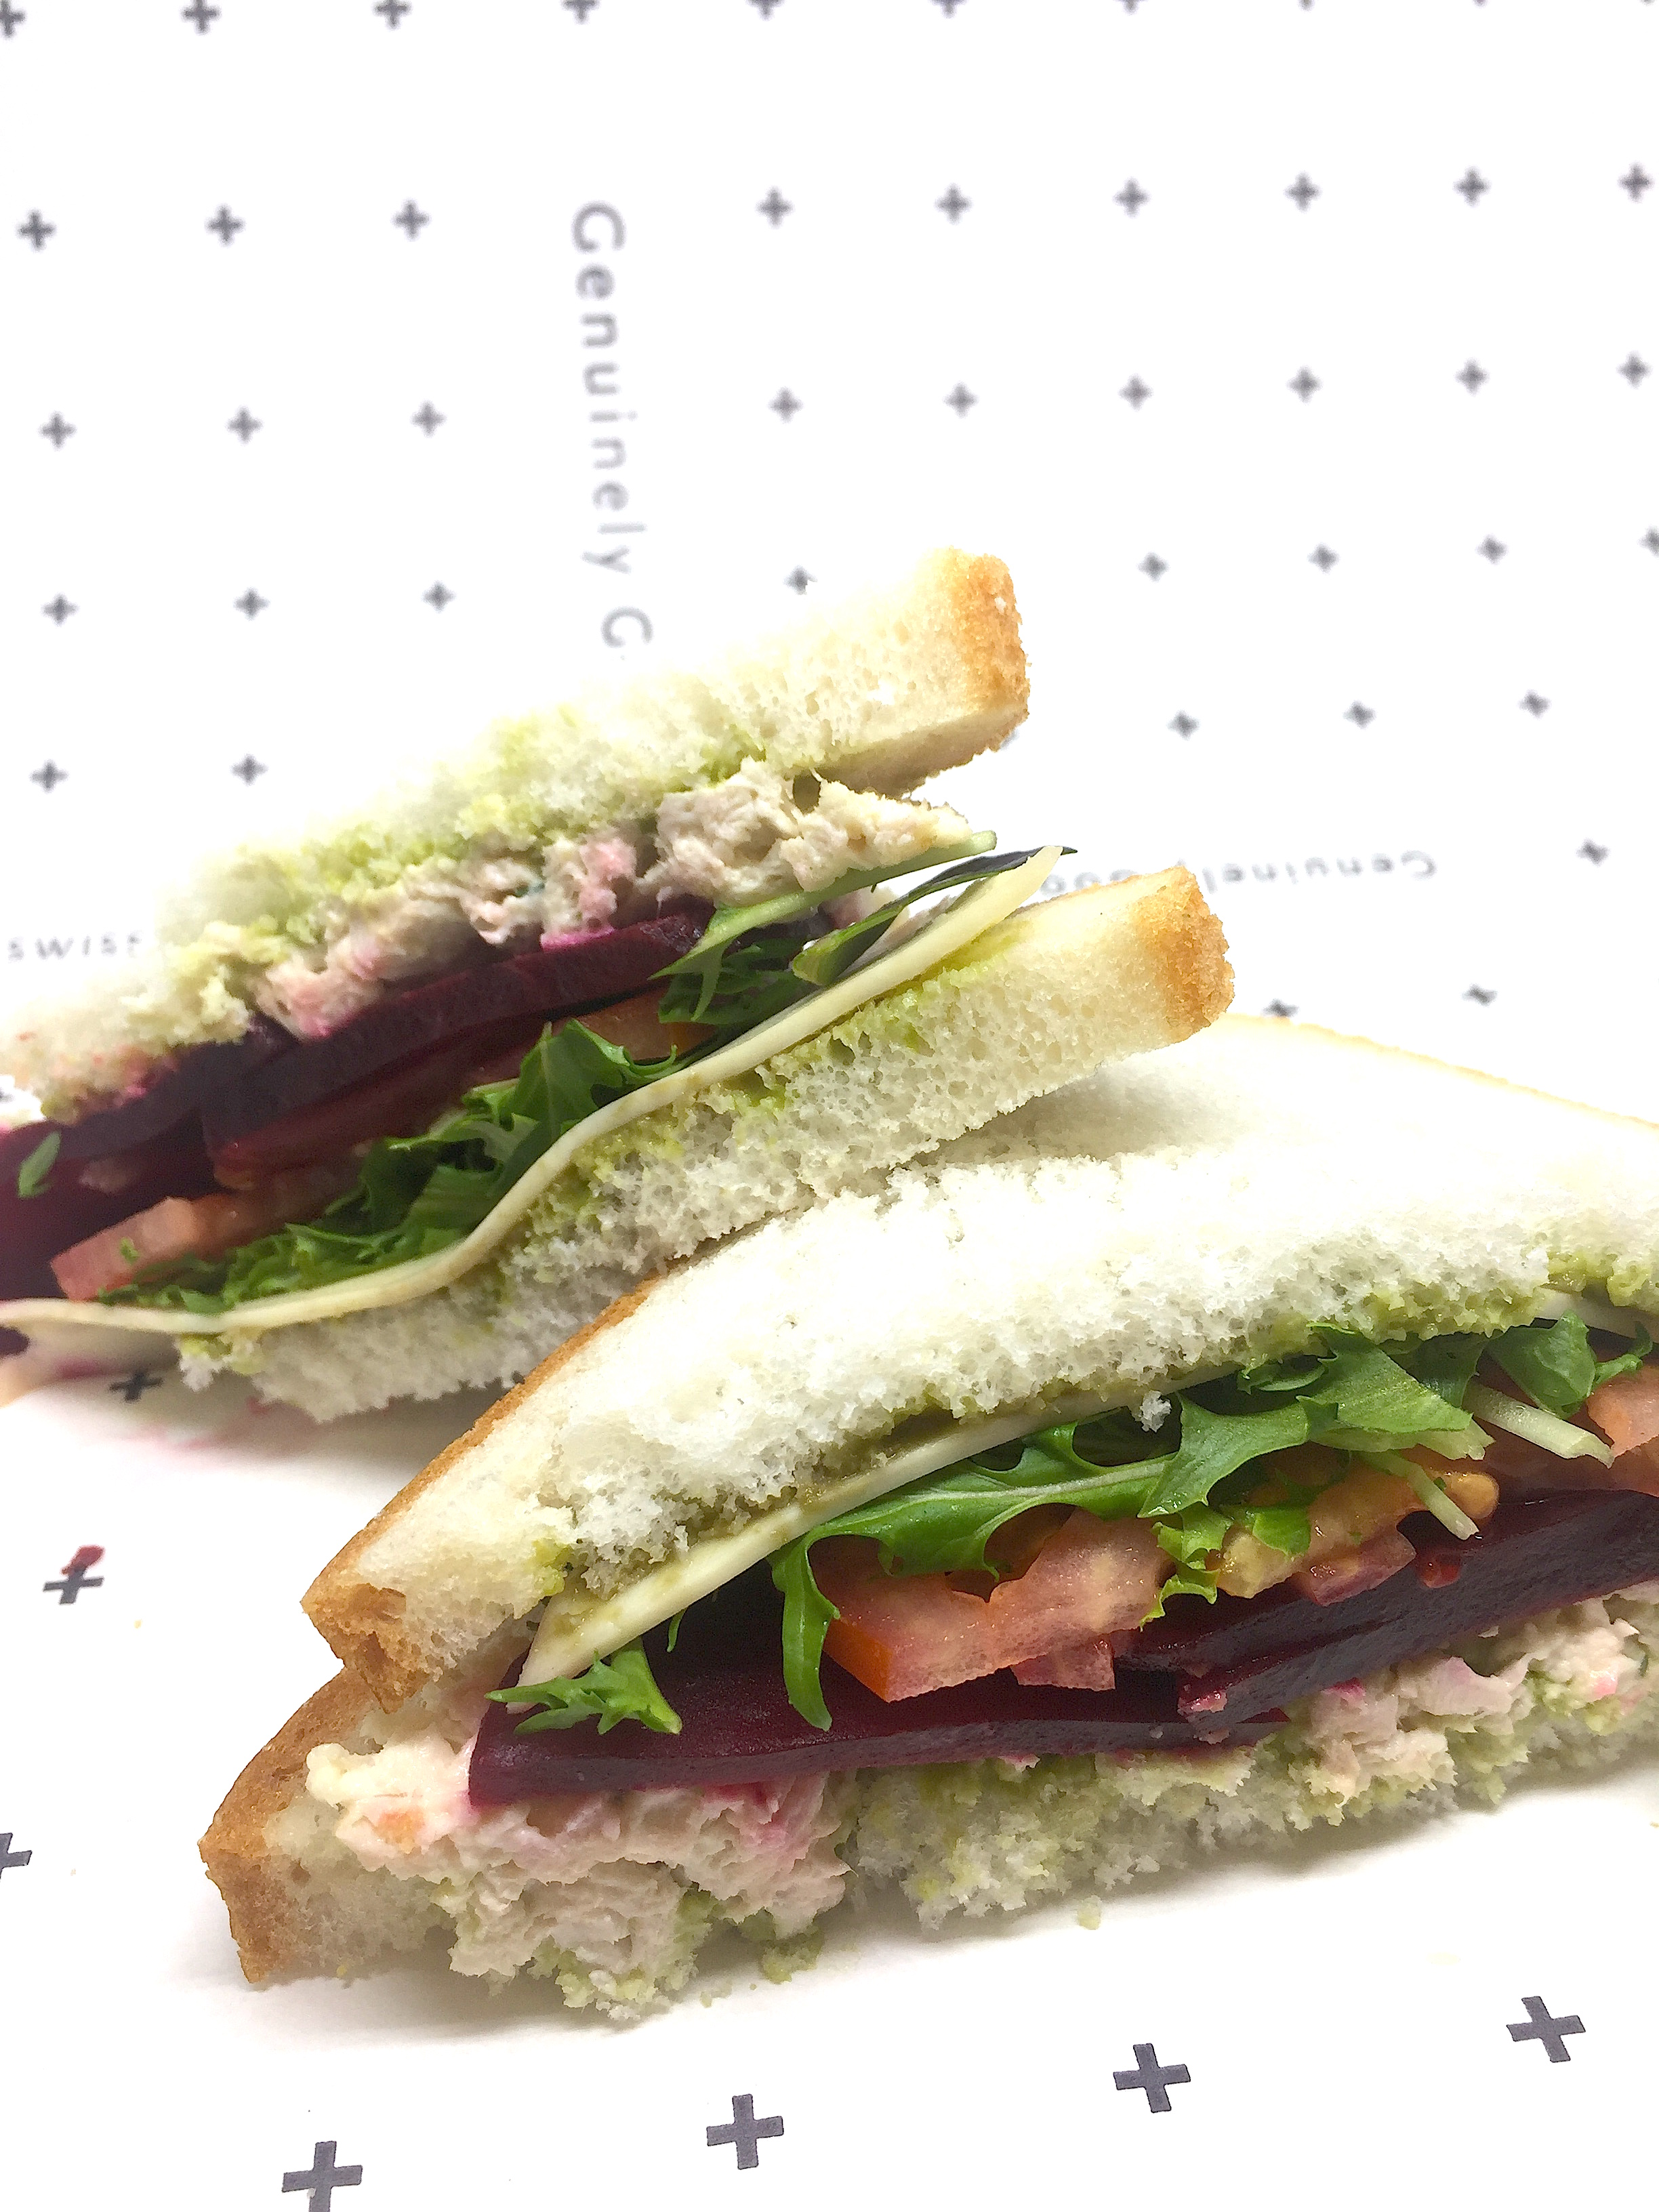 36 gluten free sandwich box